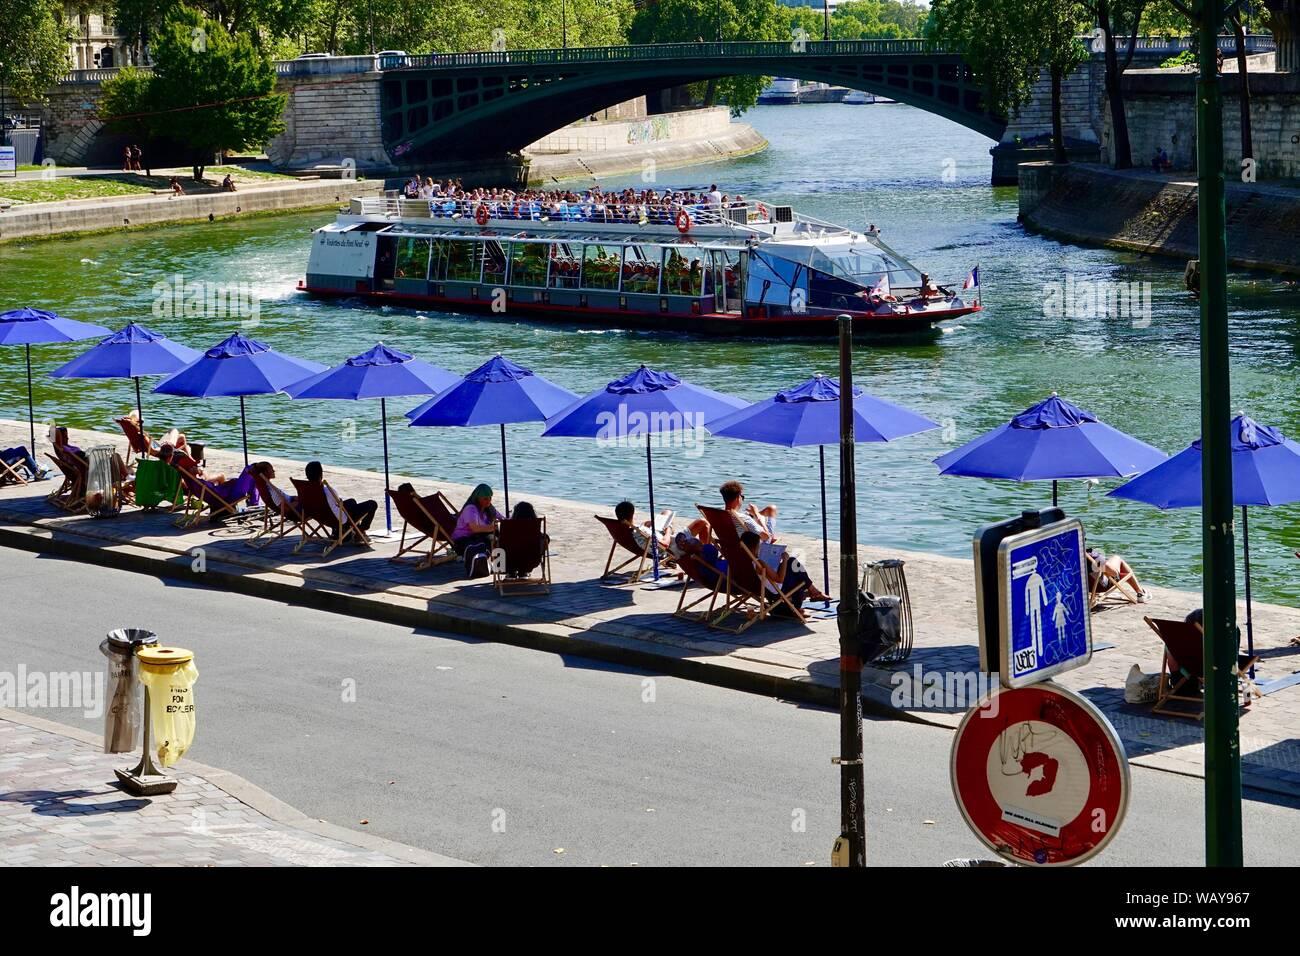 people-relaxing-under-blue-umbrellas-in-